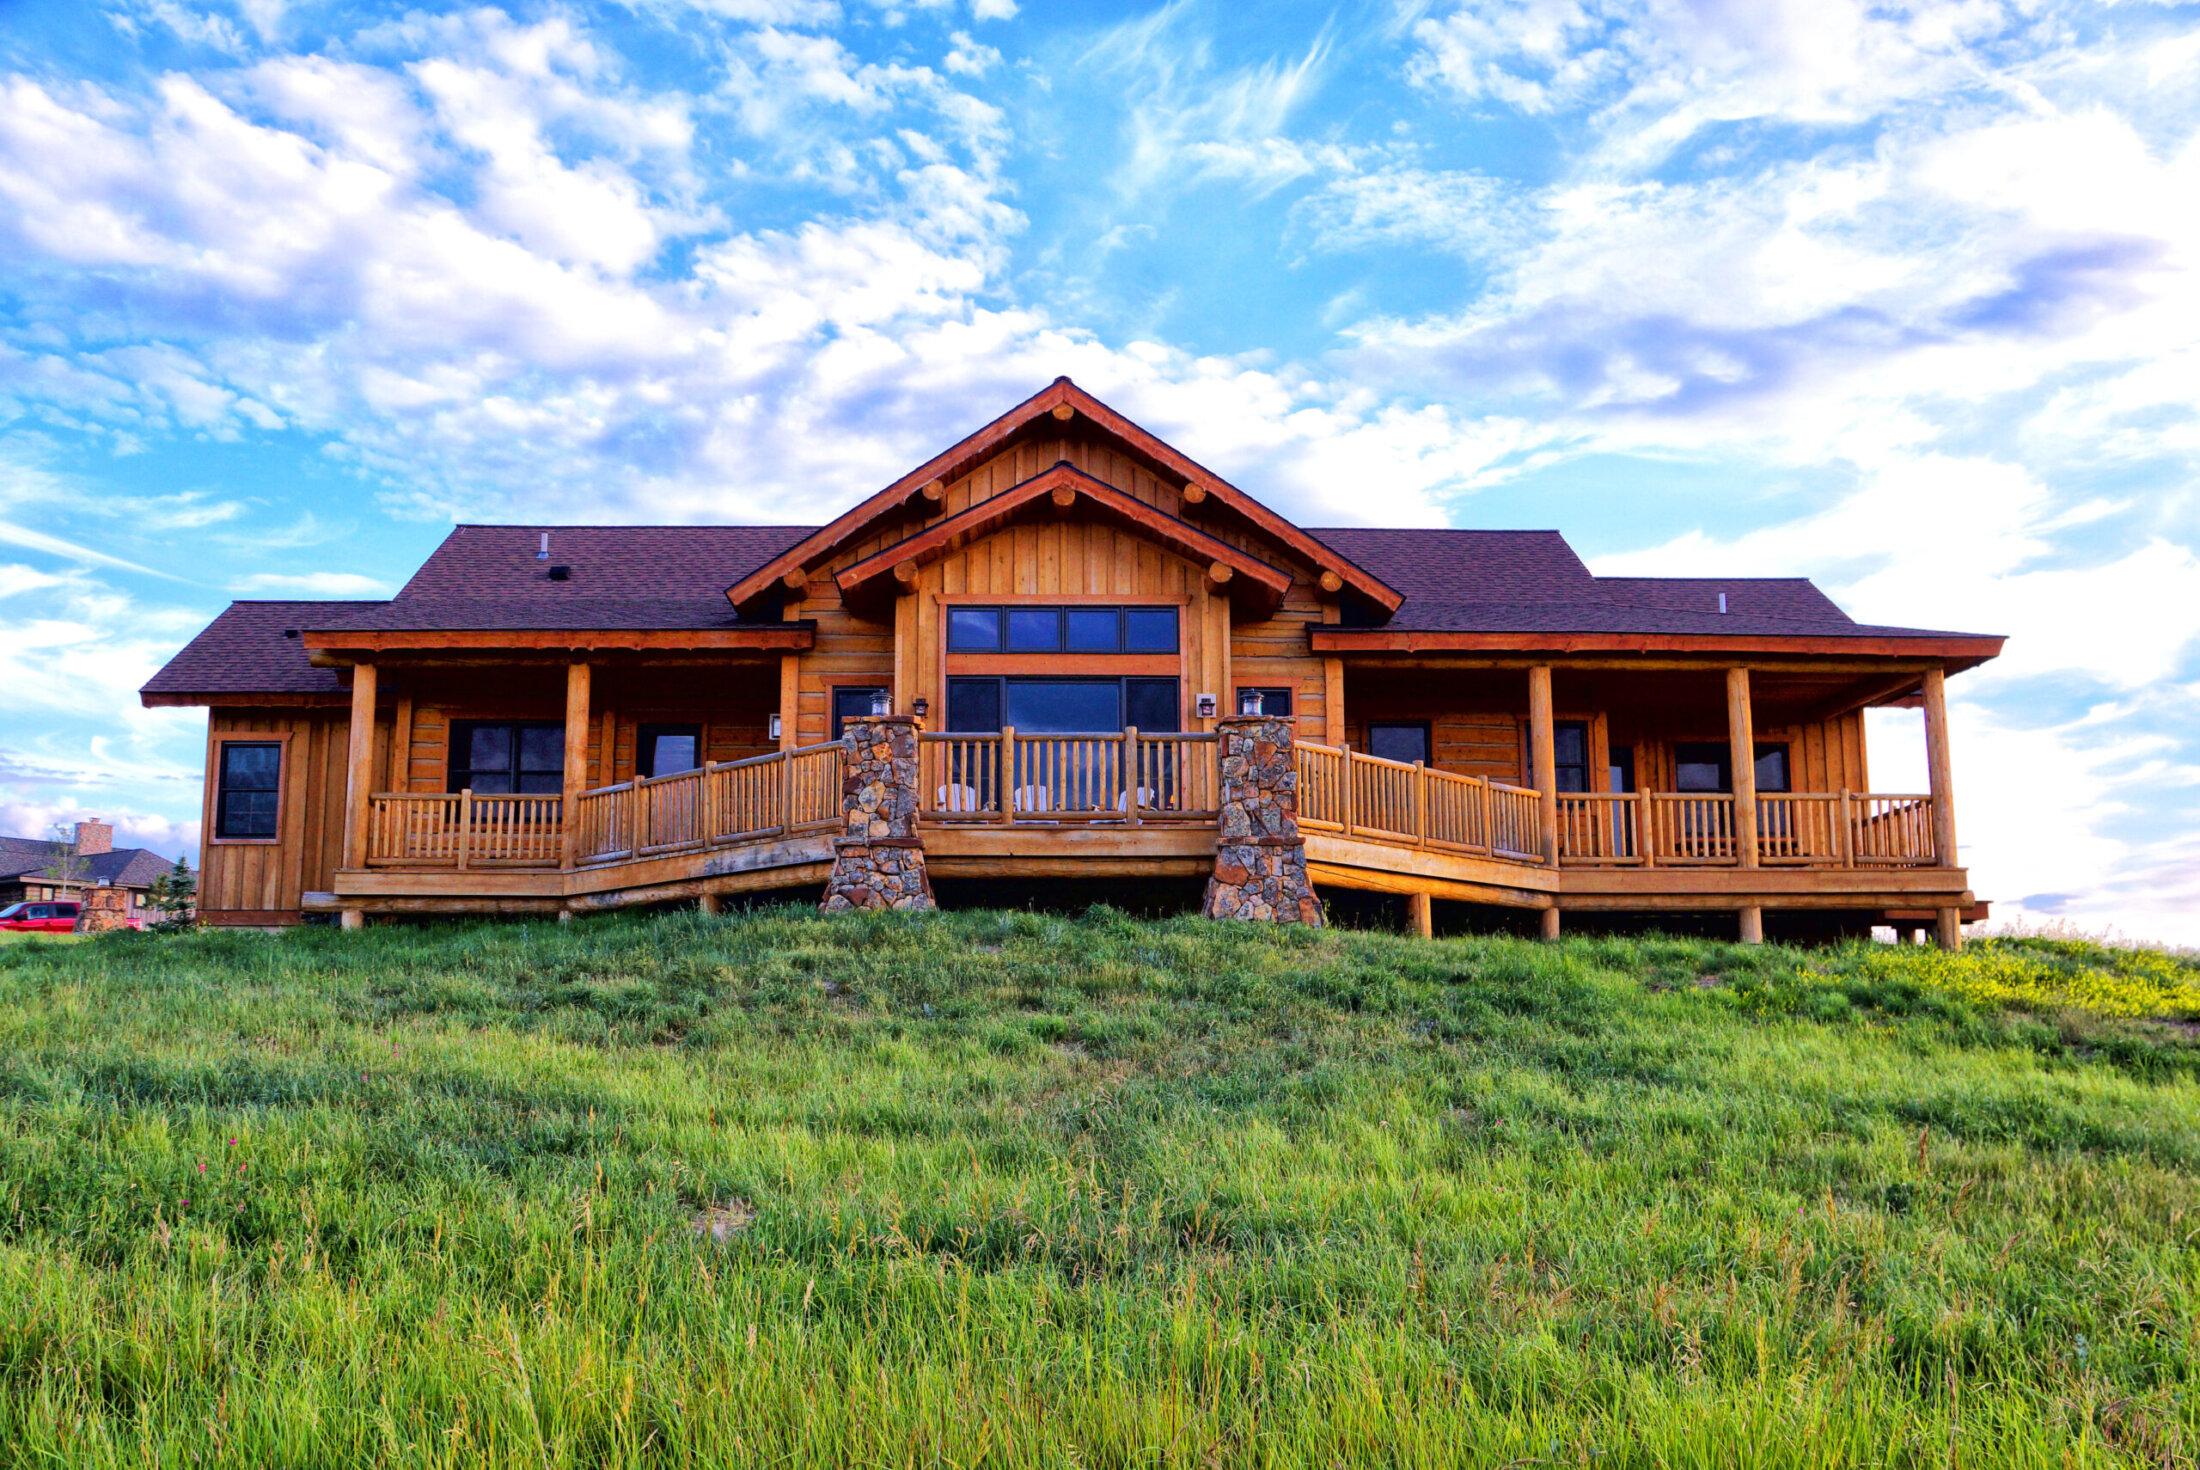 Sweetgrass Ranch